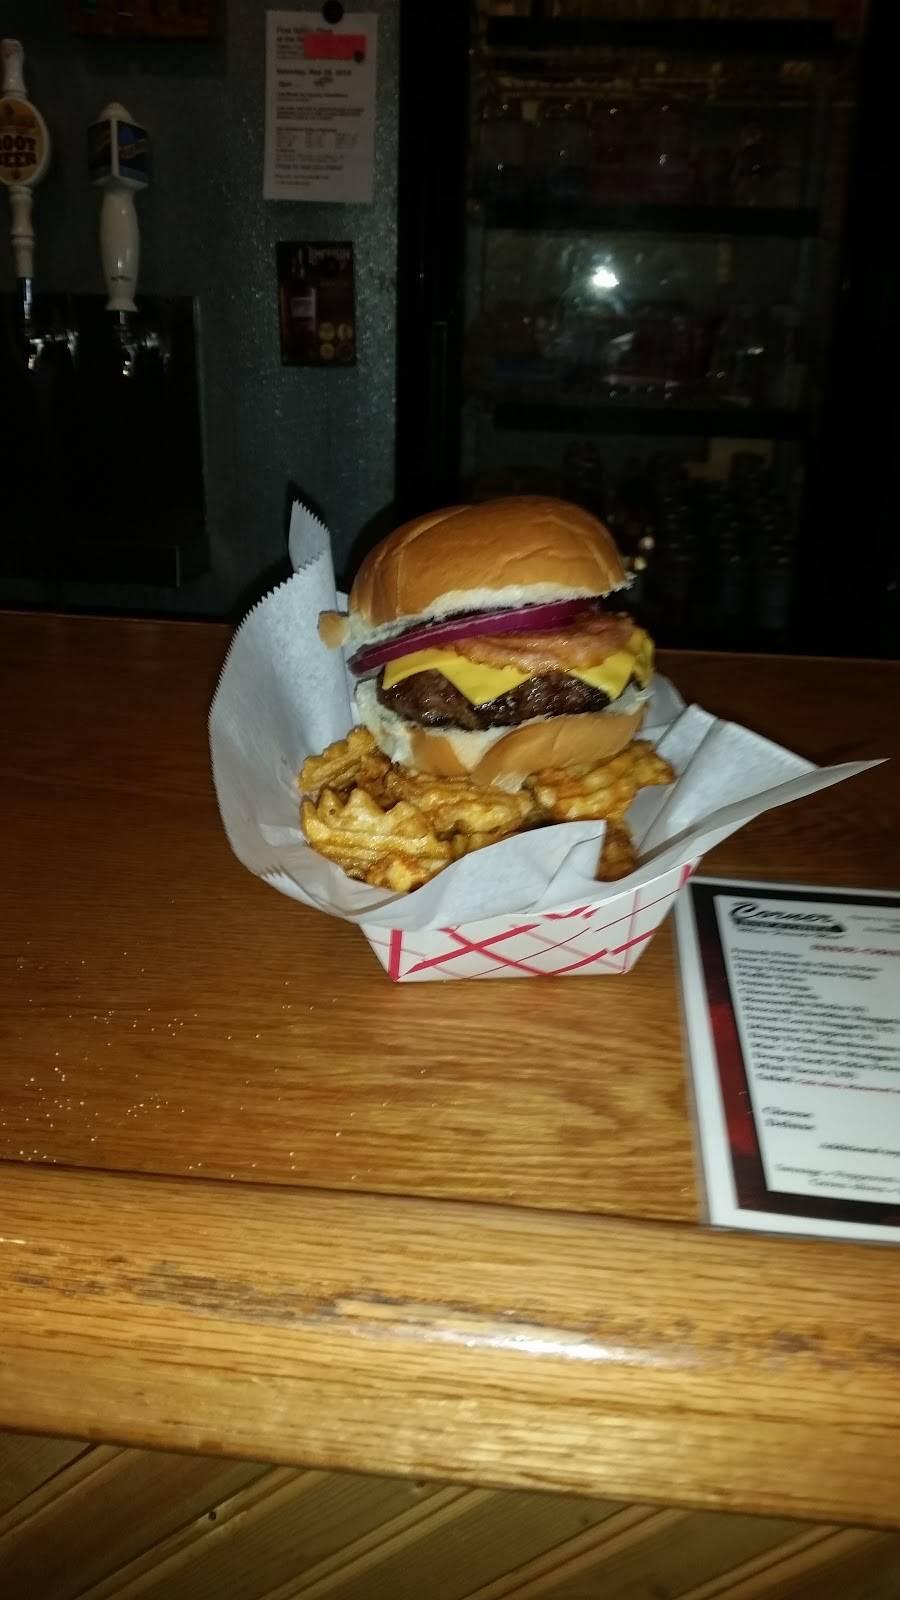 Mikes Corner Bar | meal takeaway | 203 Main St, Darlington, WI 53530, USA | 6087763300 OR +1 608-776-3300